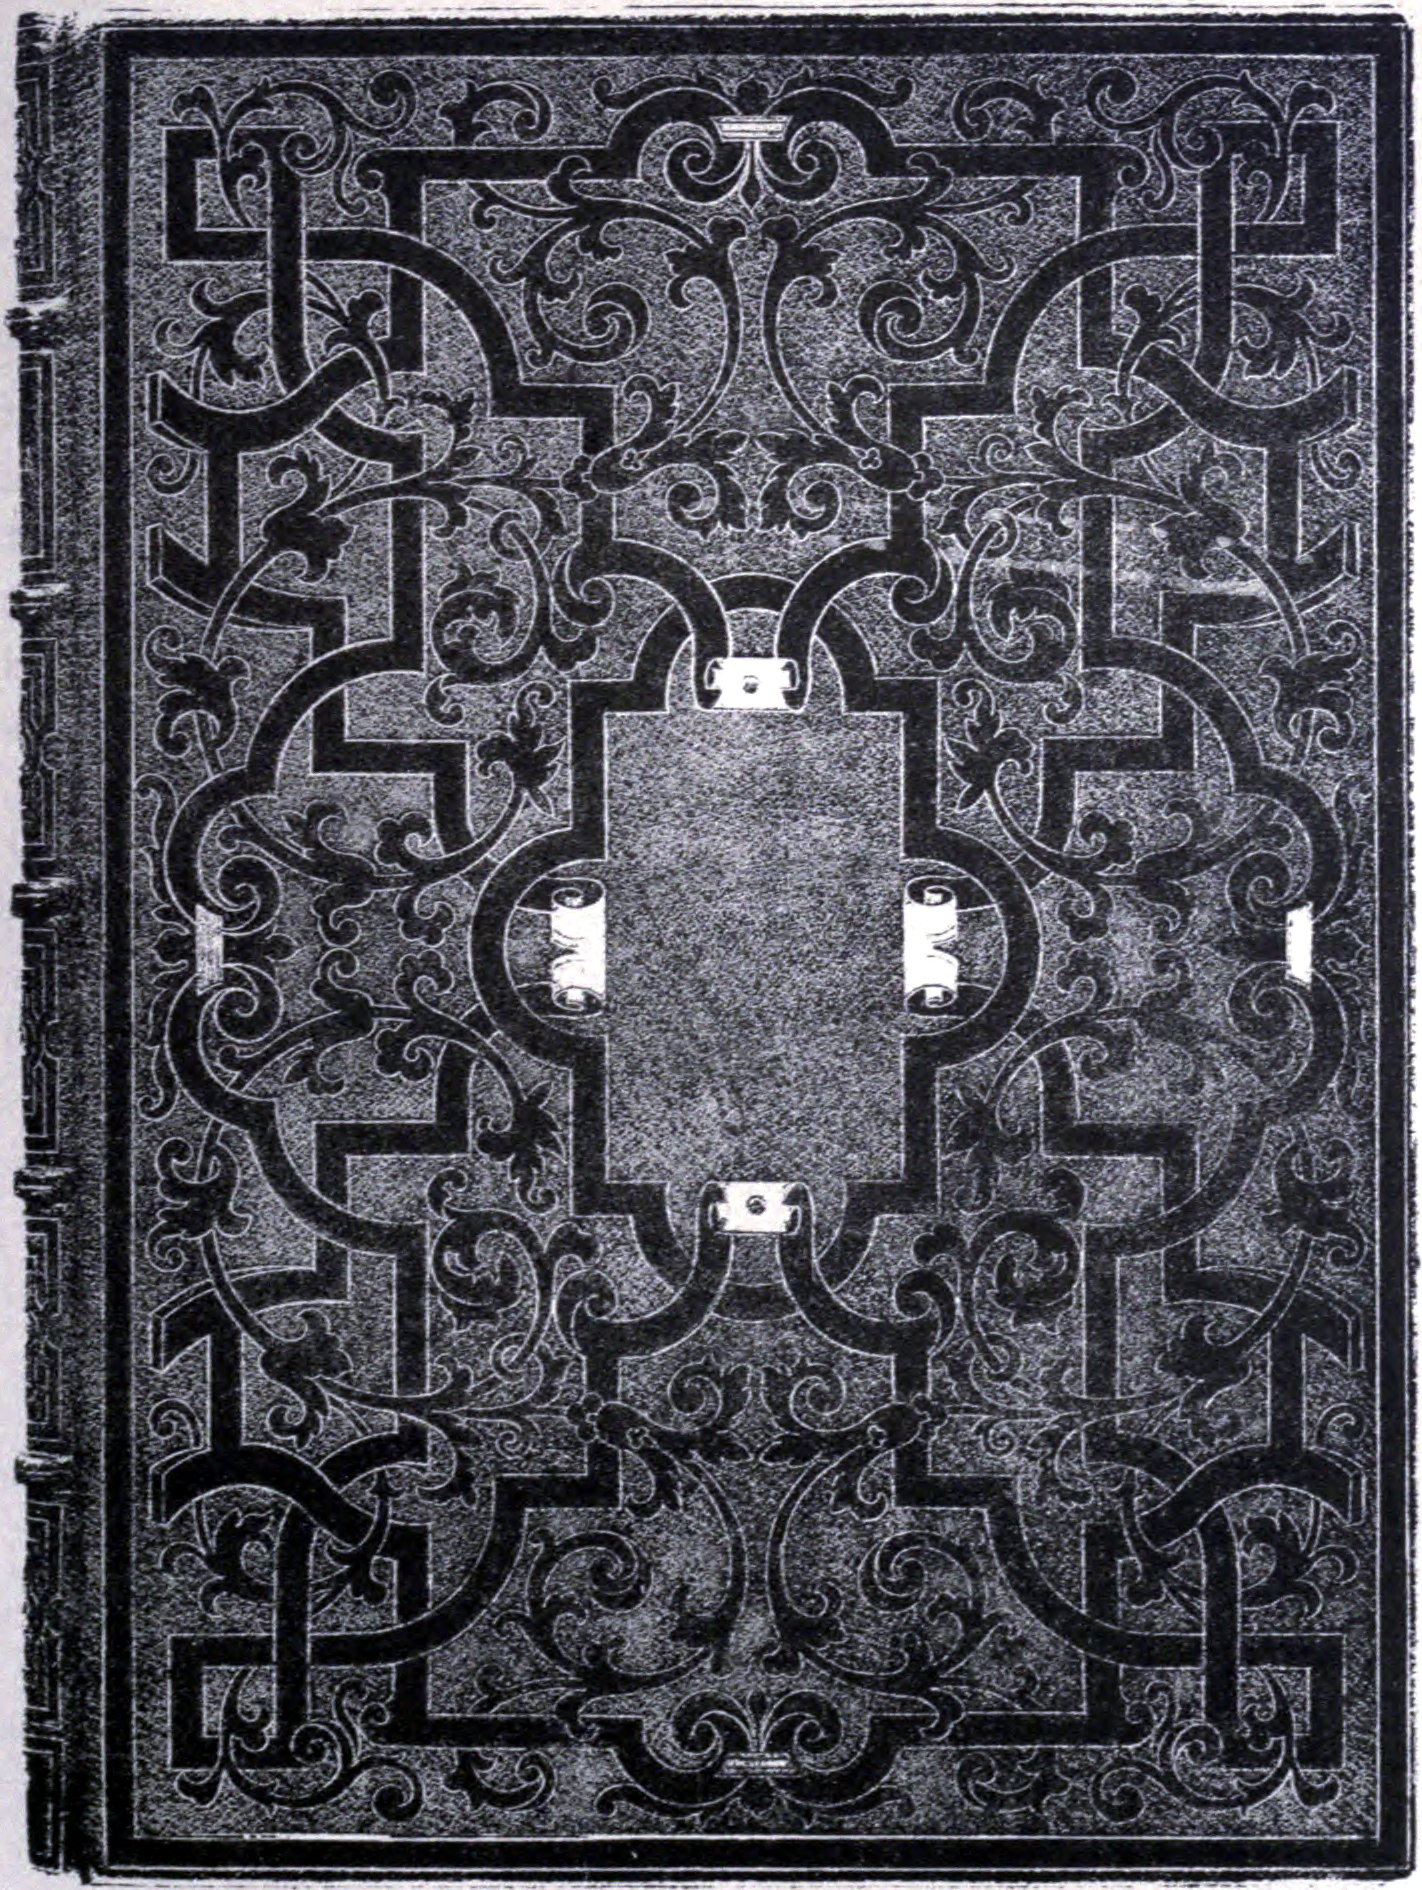 Plain Black Book Cover : File art of bookbinding p maioli wikimedia commons